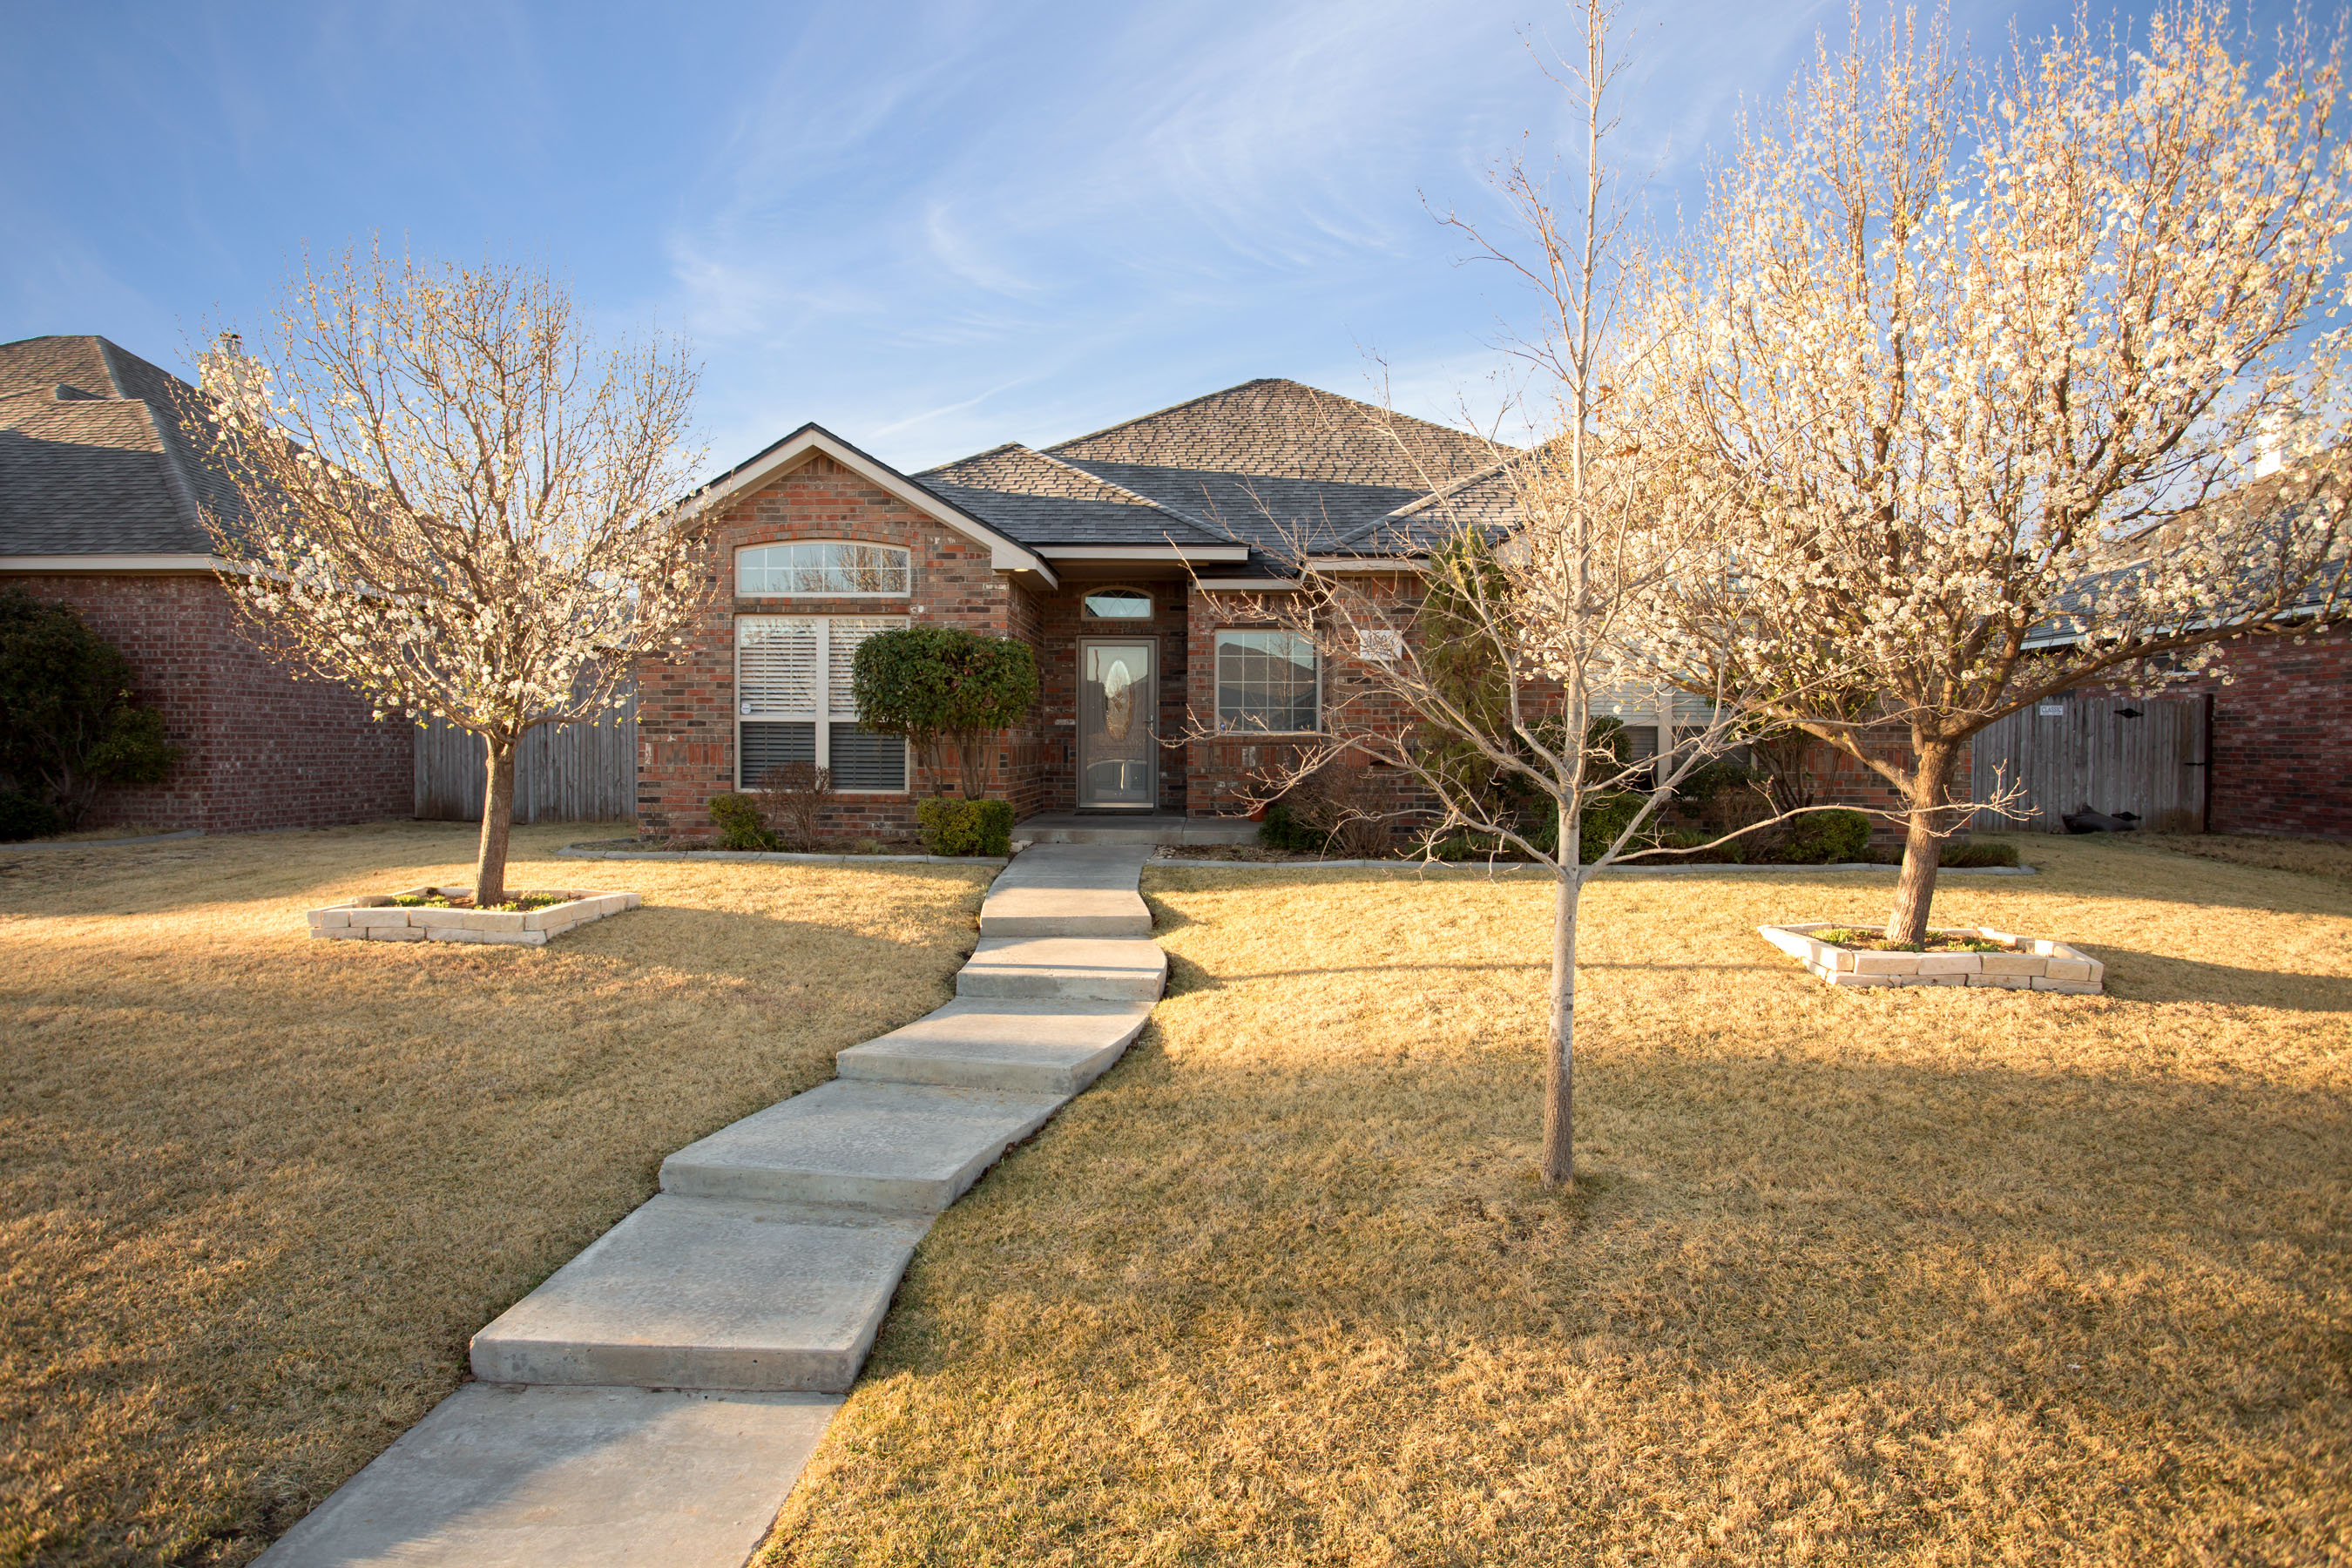 1603 Allison Ln, Amarillo, TX 79118